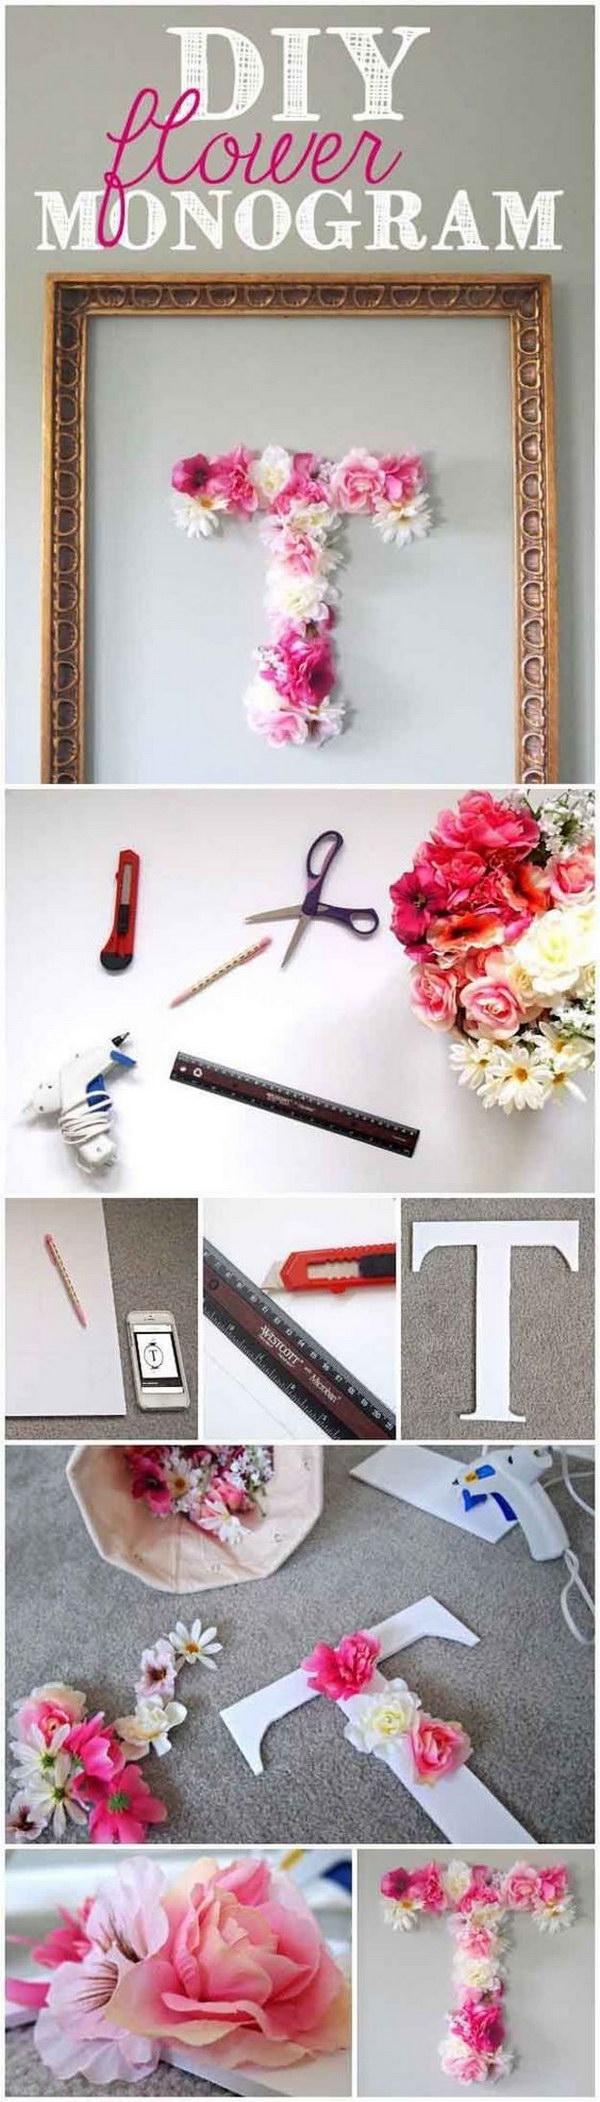 Cool Teenage Girl Bedroom Decorating Ideas - Noted List on Girls Room Decoration  id=21381